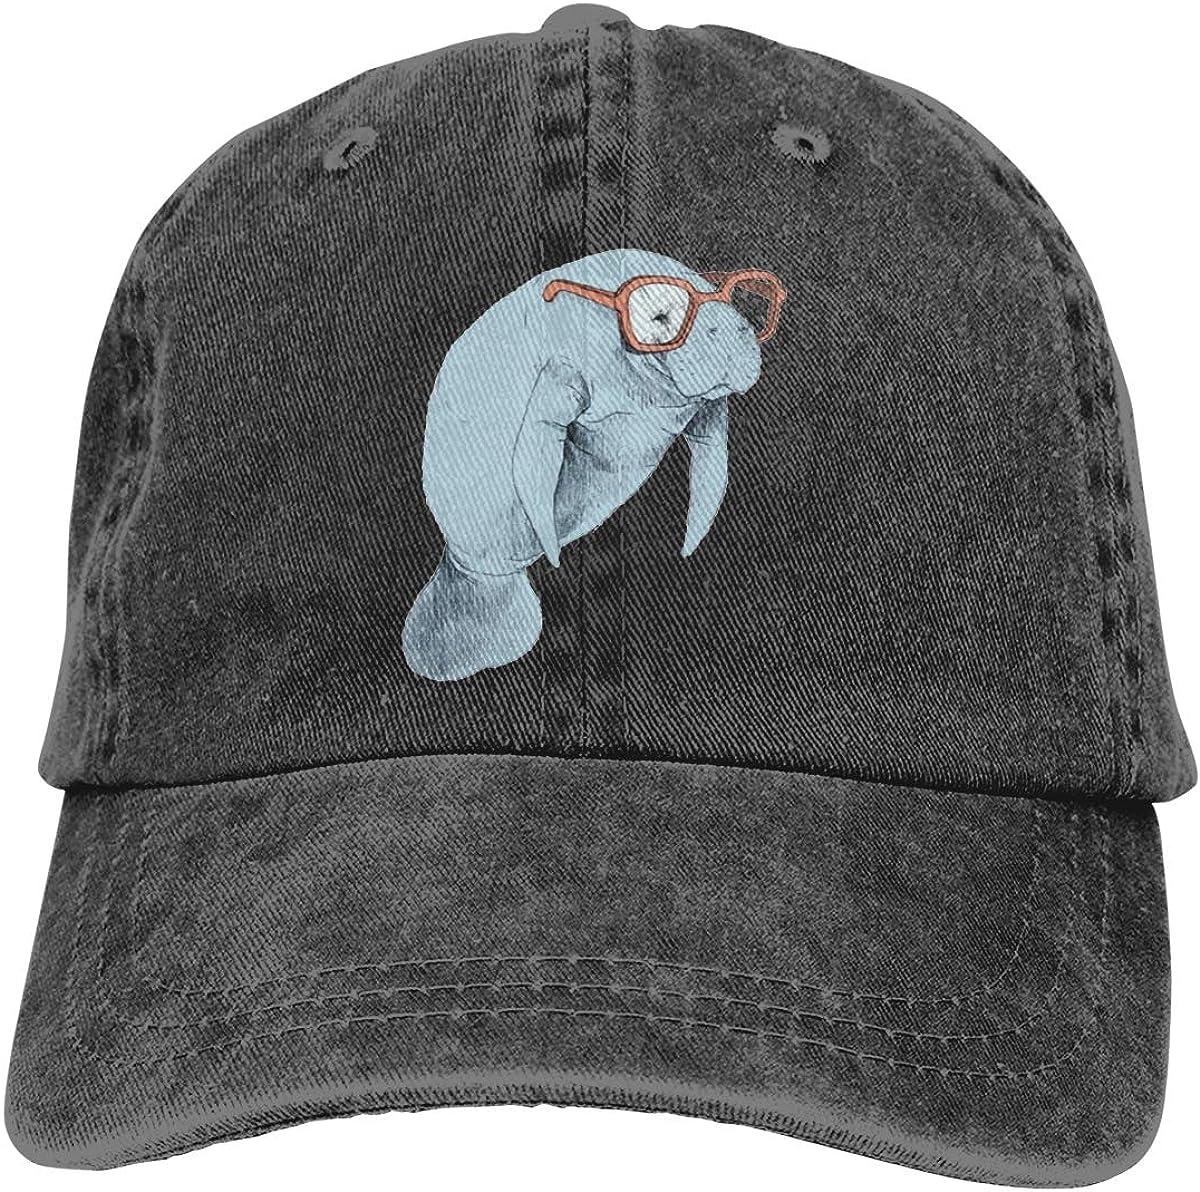 allgobee Washed Distressed Cotton Dad Hat Studious Manatee Baseball Cap Adjustable Polo Trucker Black